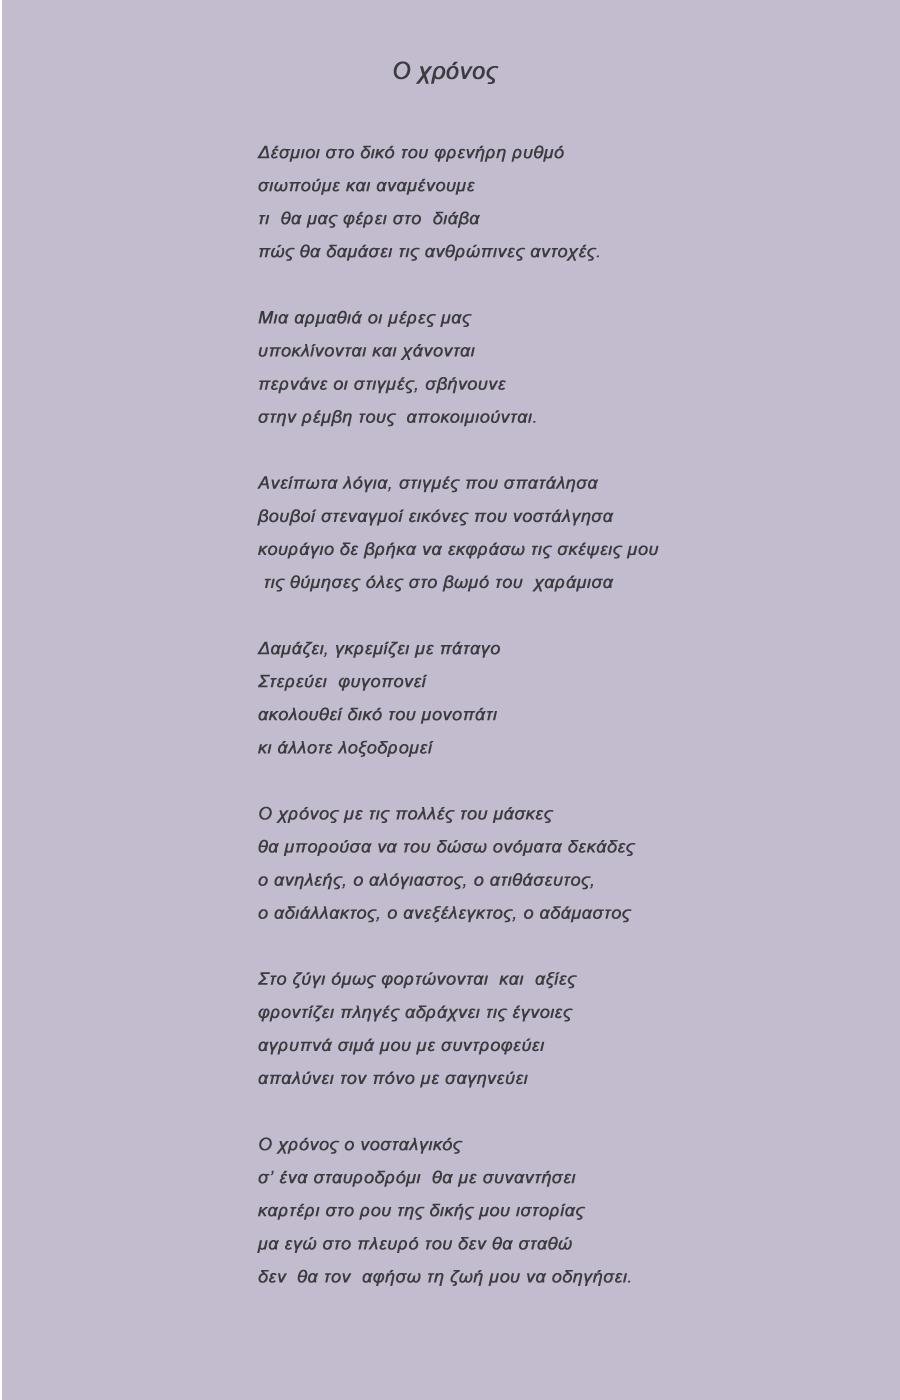 poem_3_Ο χρόνος